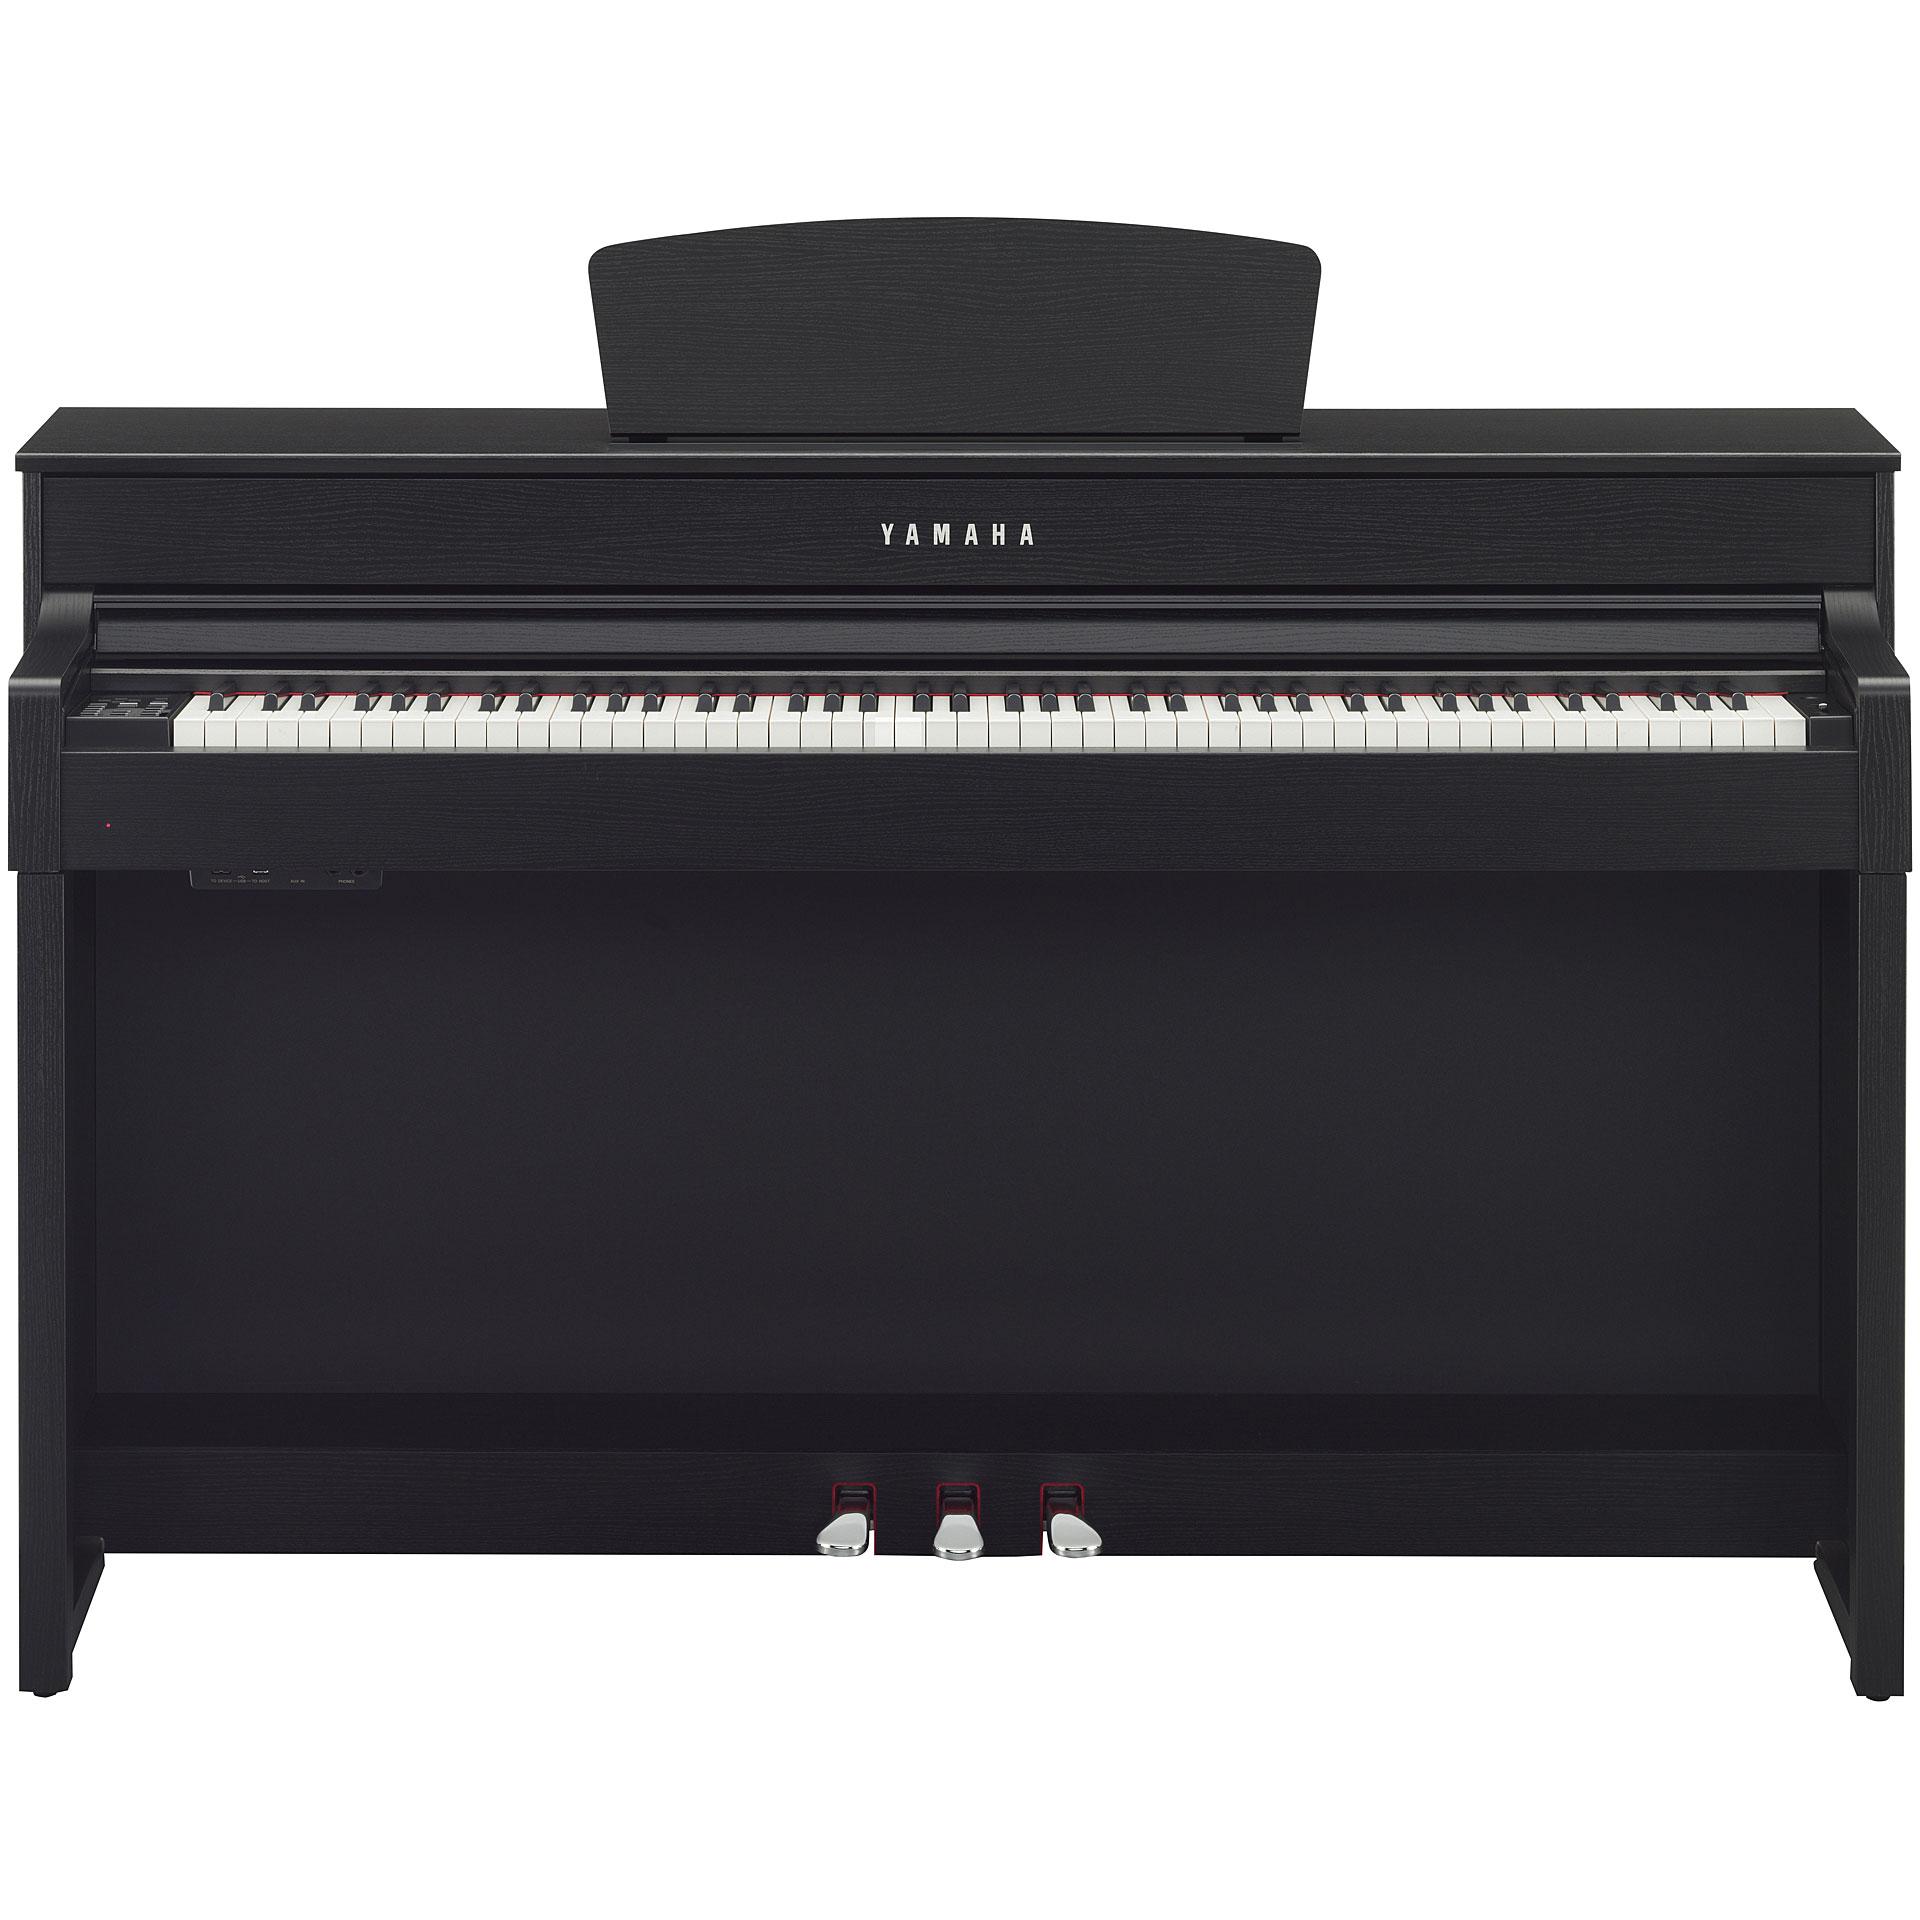 yamaha clavinova clp 535b digital piano. Black Bedroom Furniture Sets. Home Design Ideas